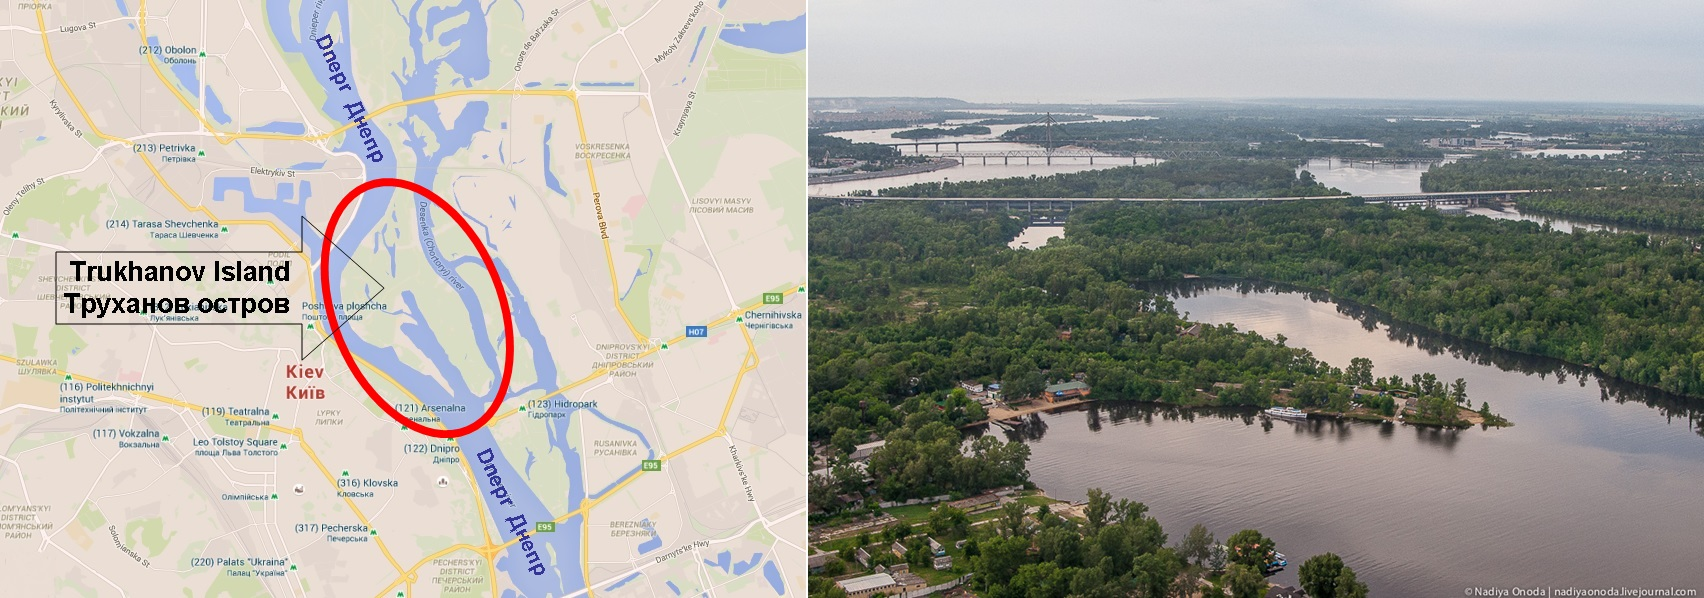 Ev 08 Trukhanov Island